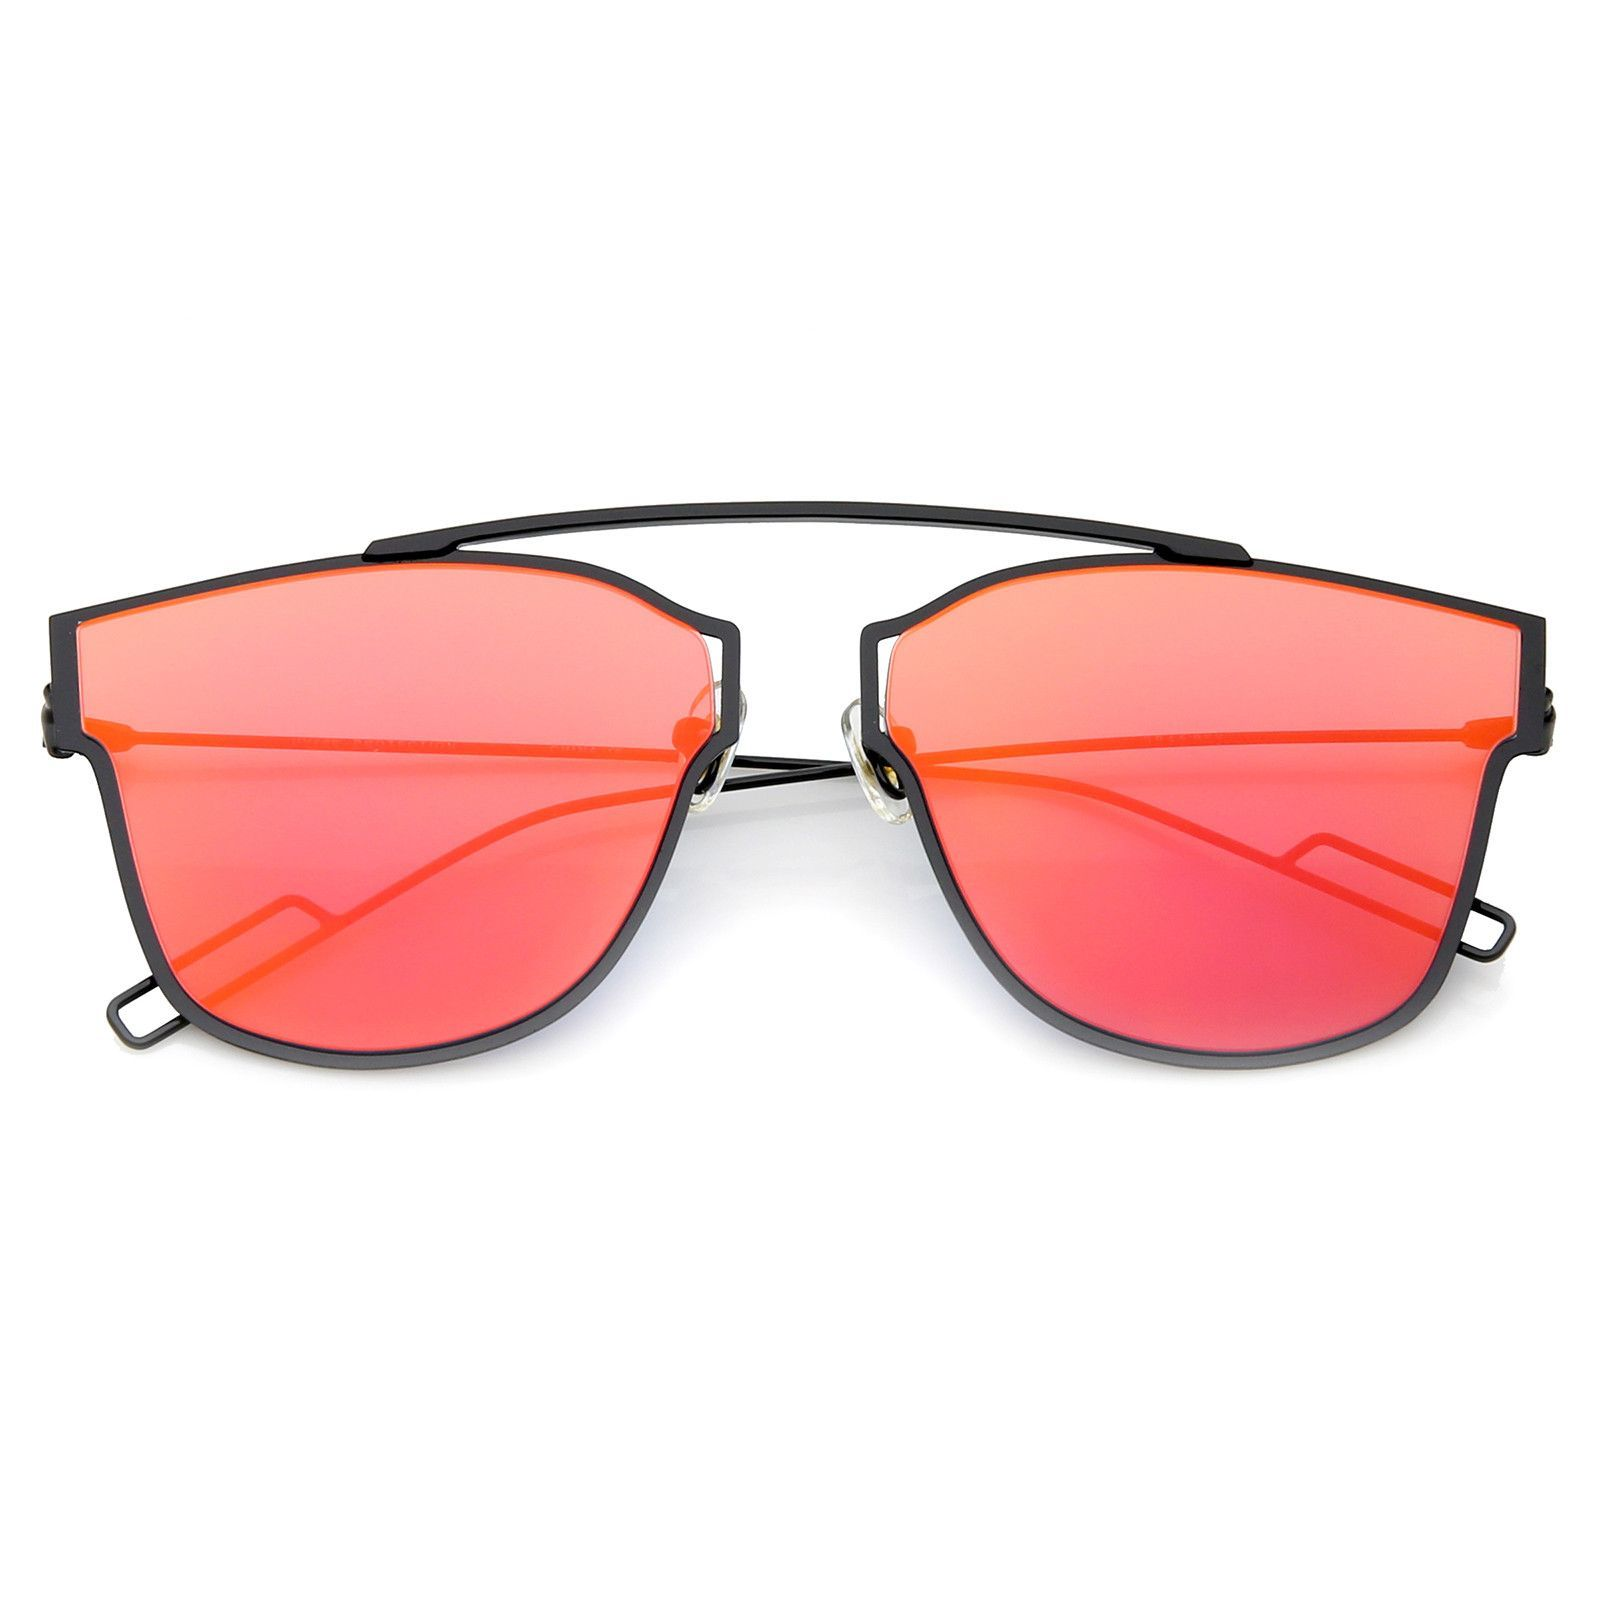 e8995a9d38 Modern Flash Mirror Lens Ultra Thin Open Metal Minimal Pantos Aviator  Sunglasses 59mm  mirrored  frame  cateye  sunglassla  oversized  purple   sunglasses ...